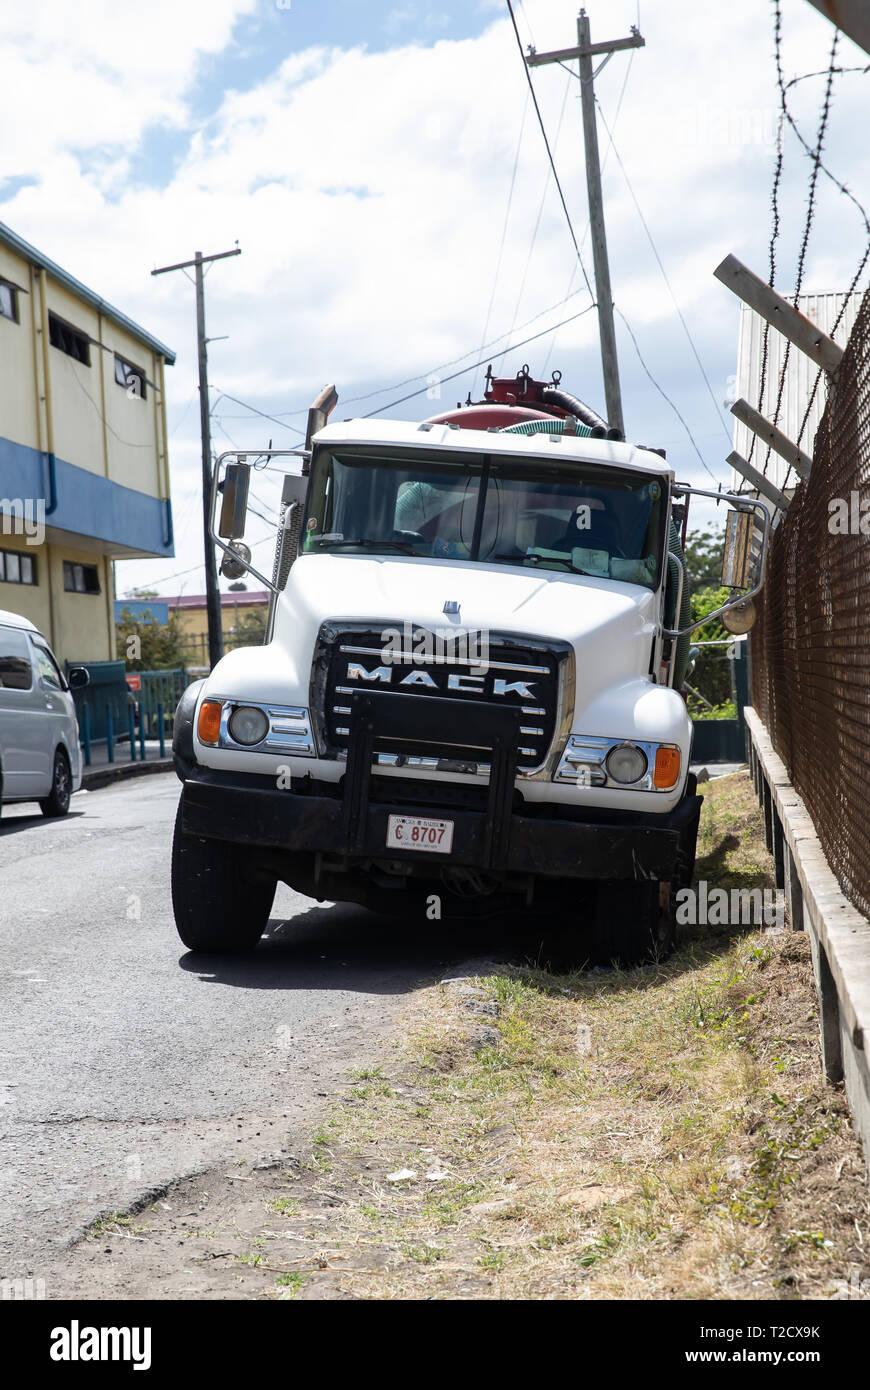 Mack truck in Saint John's, Capital of Antigua and Barbuda Stock Photo